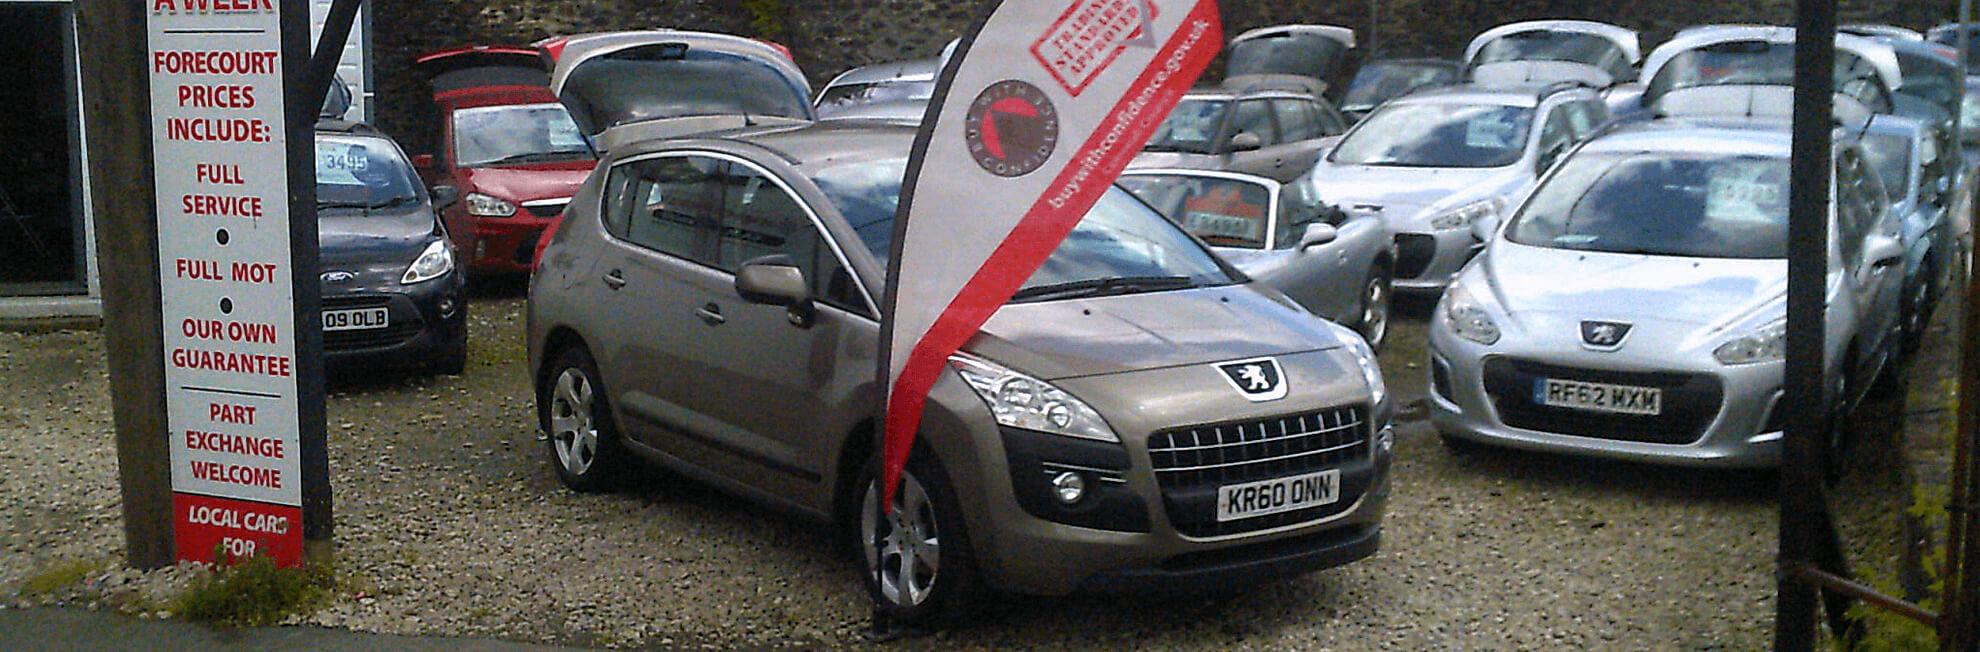 Quality Used Car Sales In Launceston Cornwall Newport